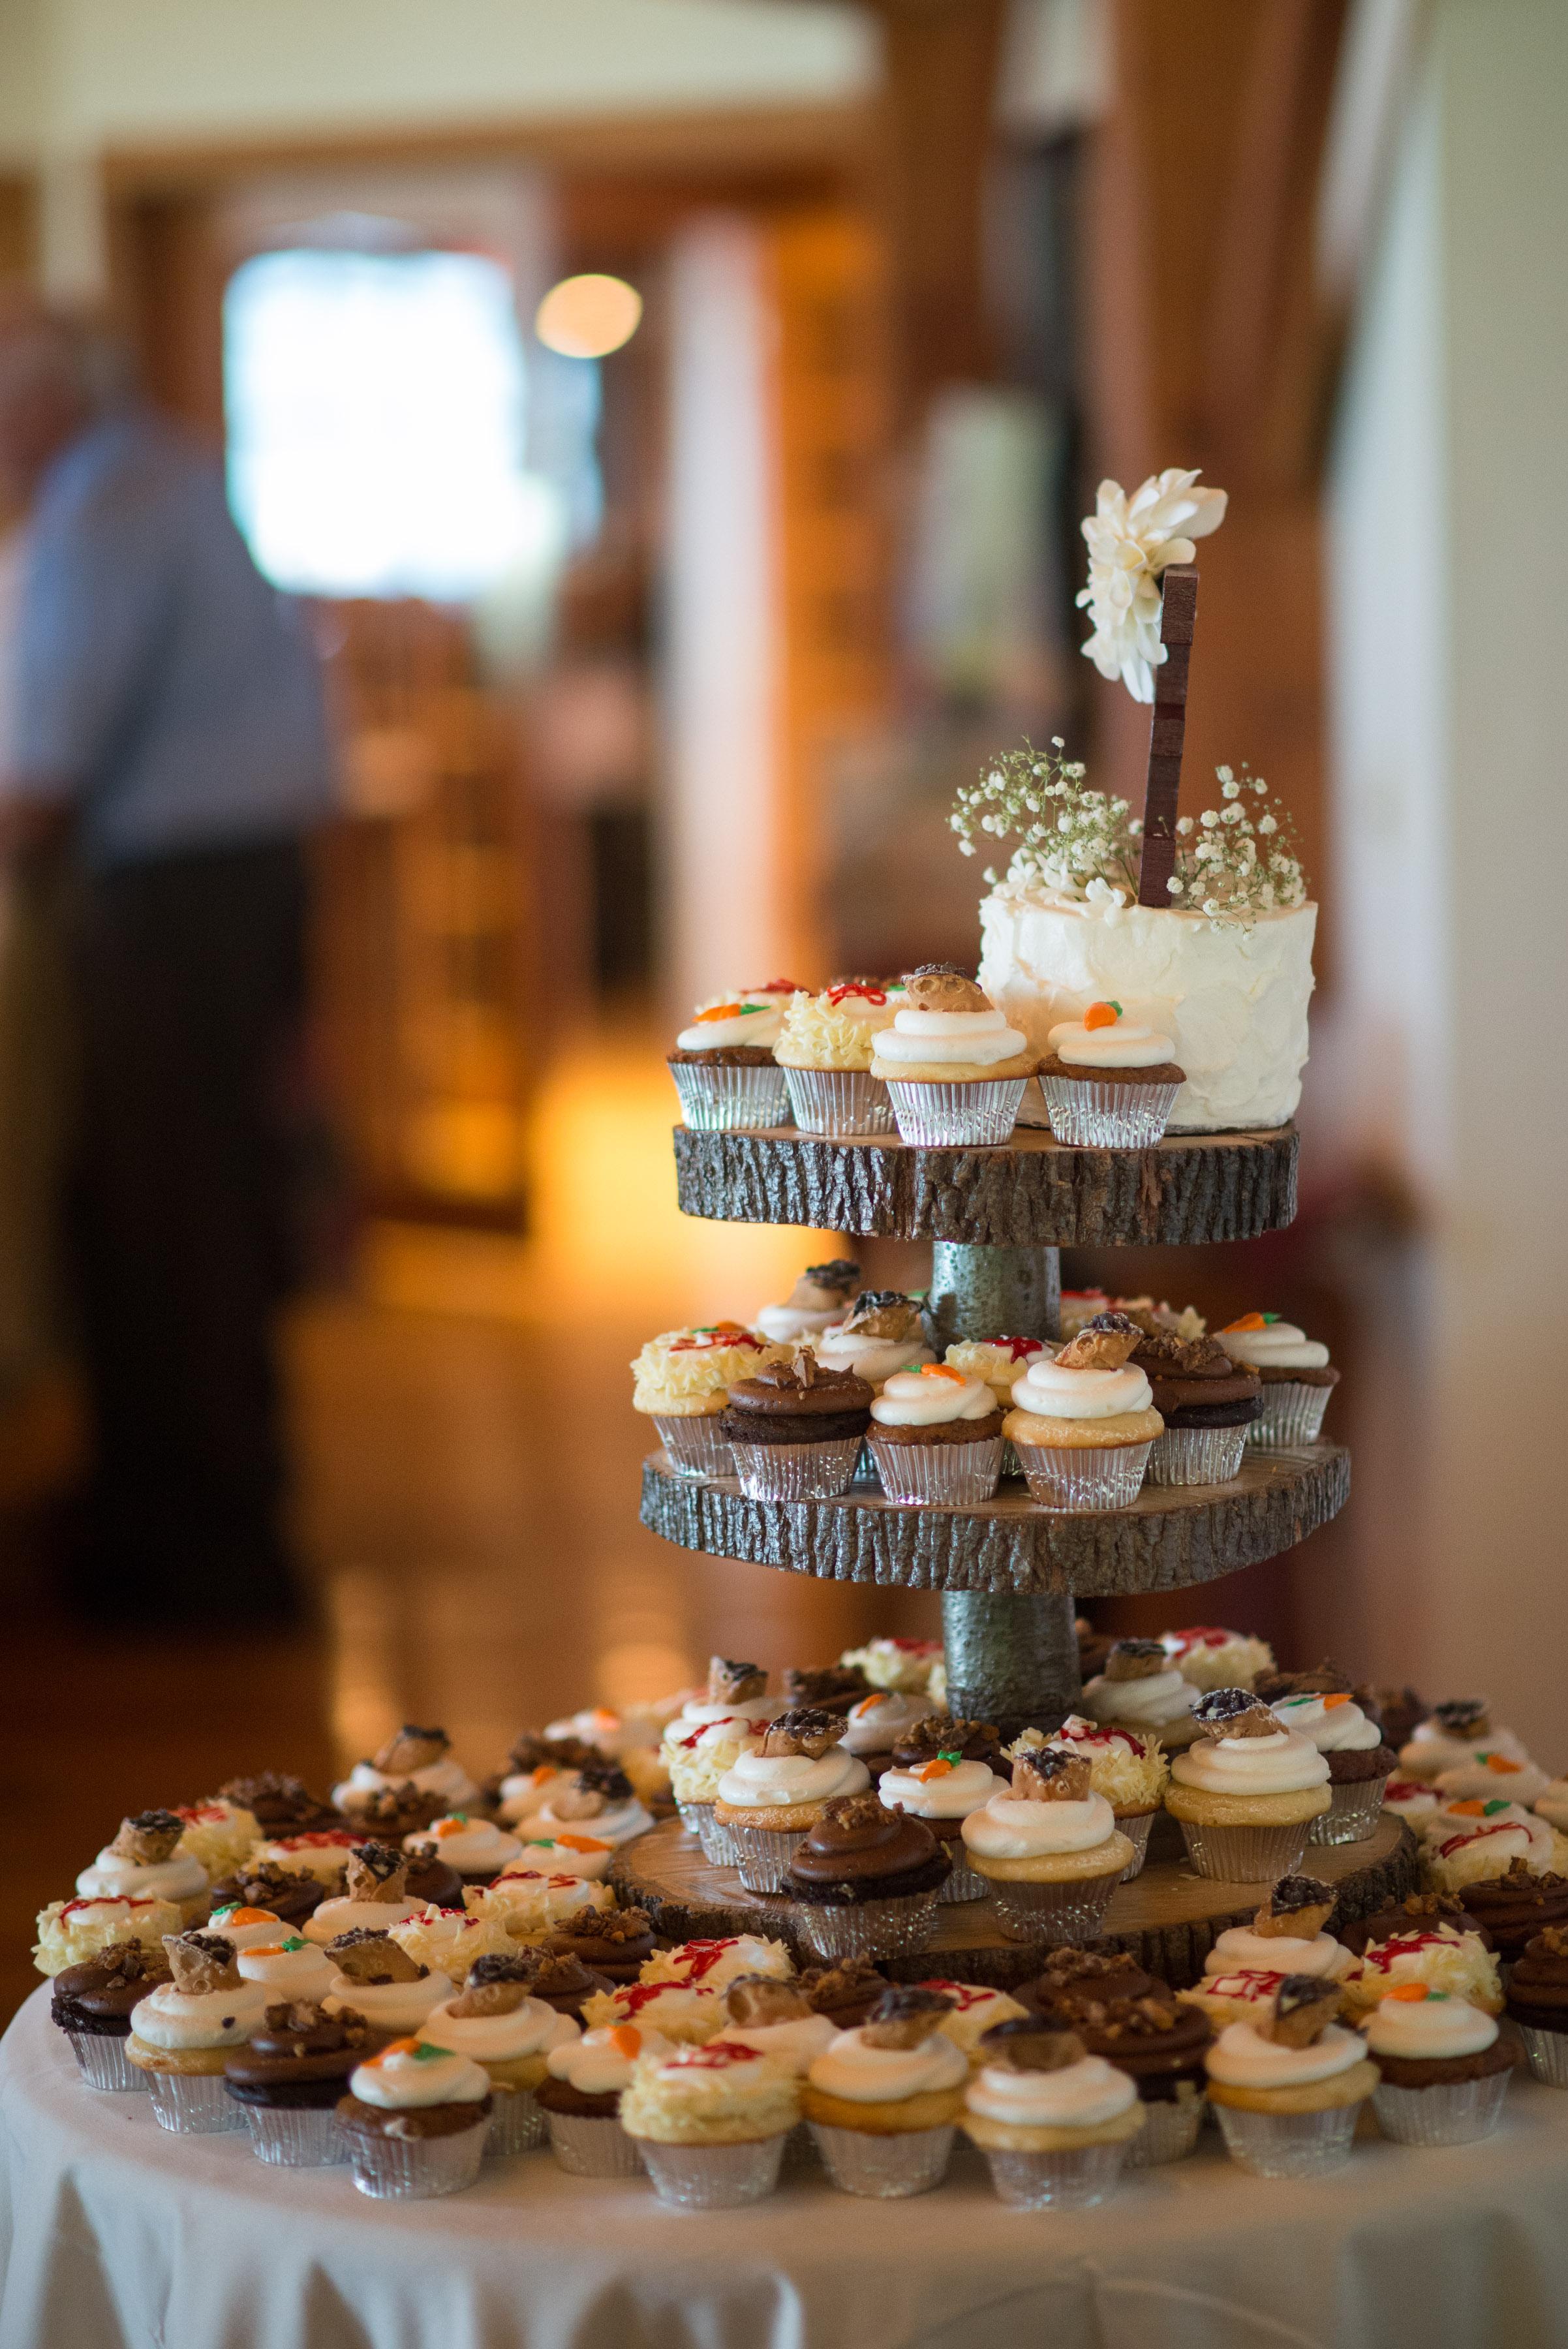 Wedding Cake wCupcakes4 Display Side